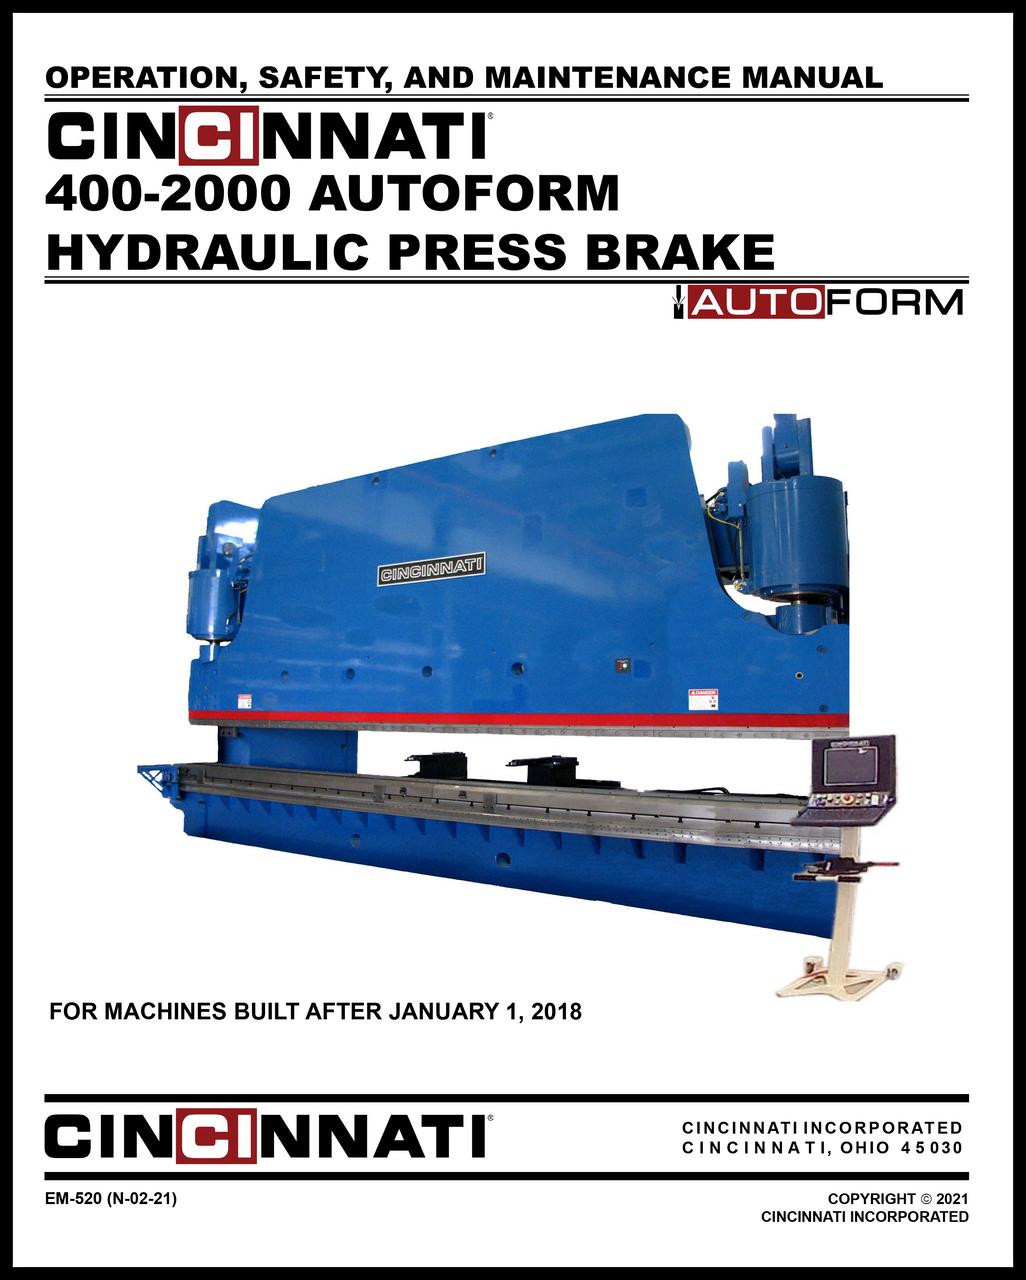 EM-520 (N-02-21) AUTOFORM 400-2000 Hydraulic Press Brake Operation, Safety and Maintenance Manual